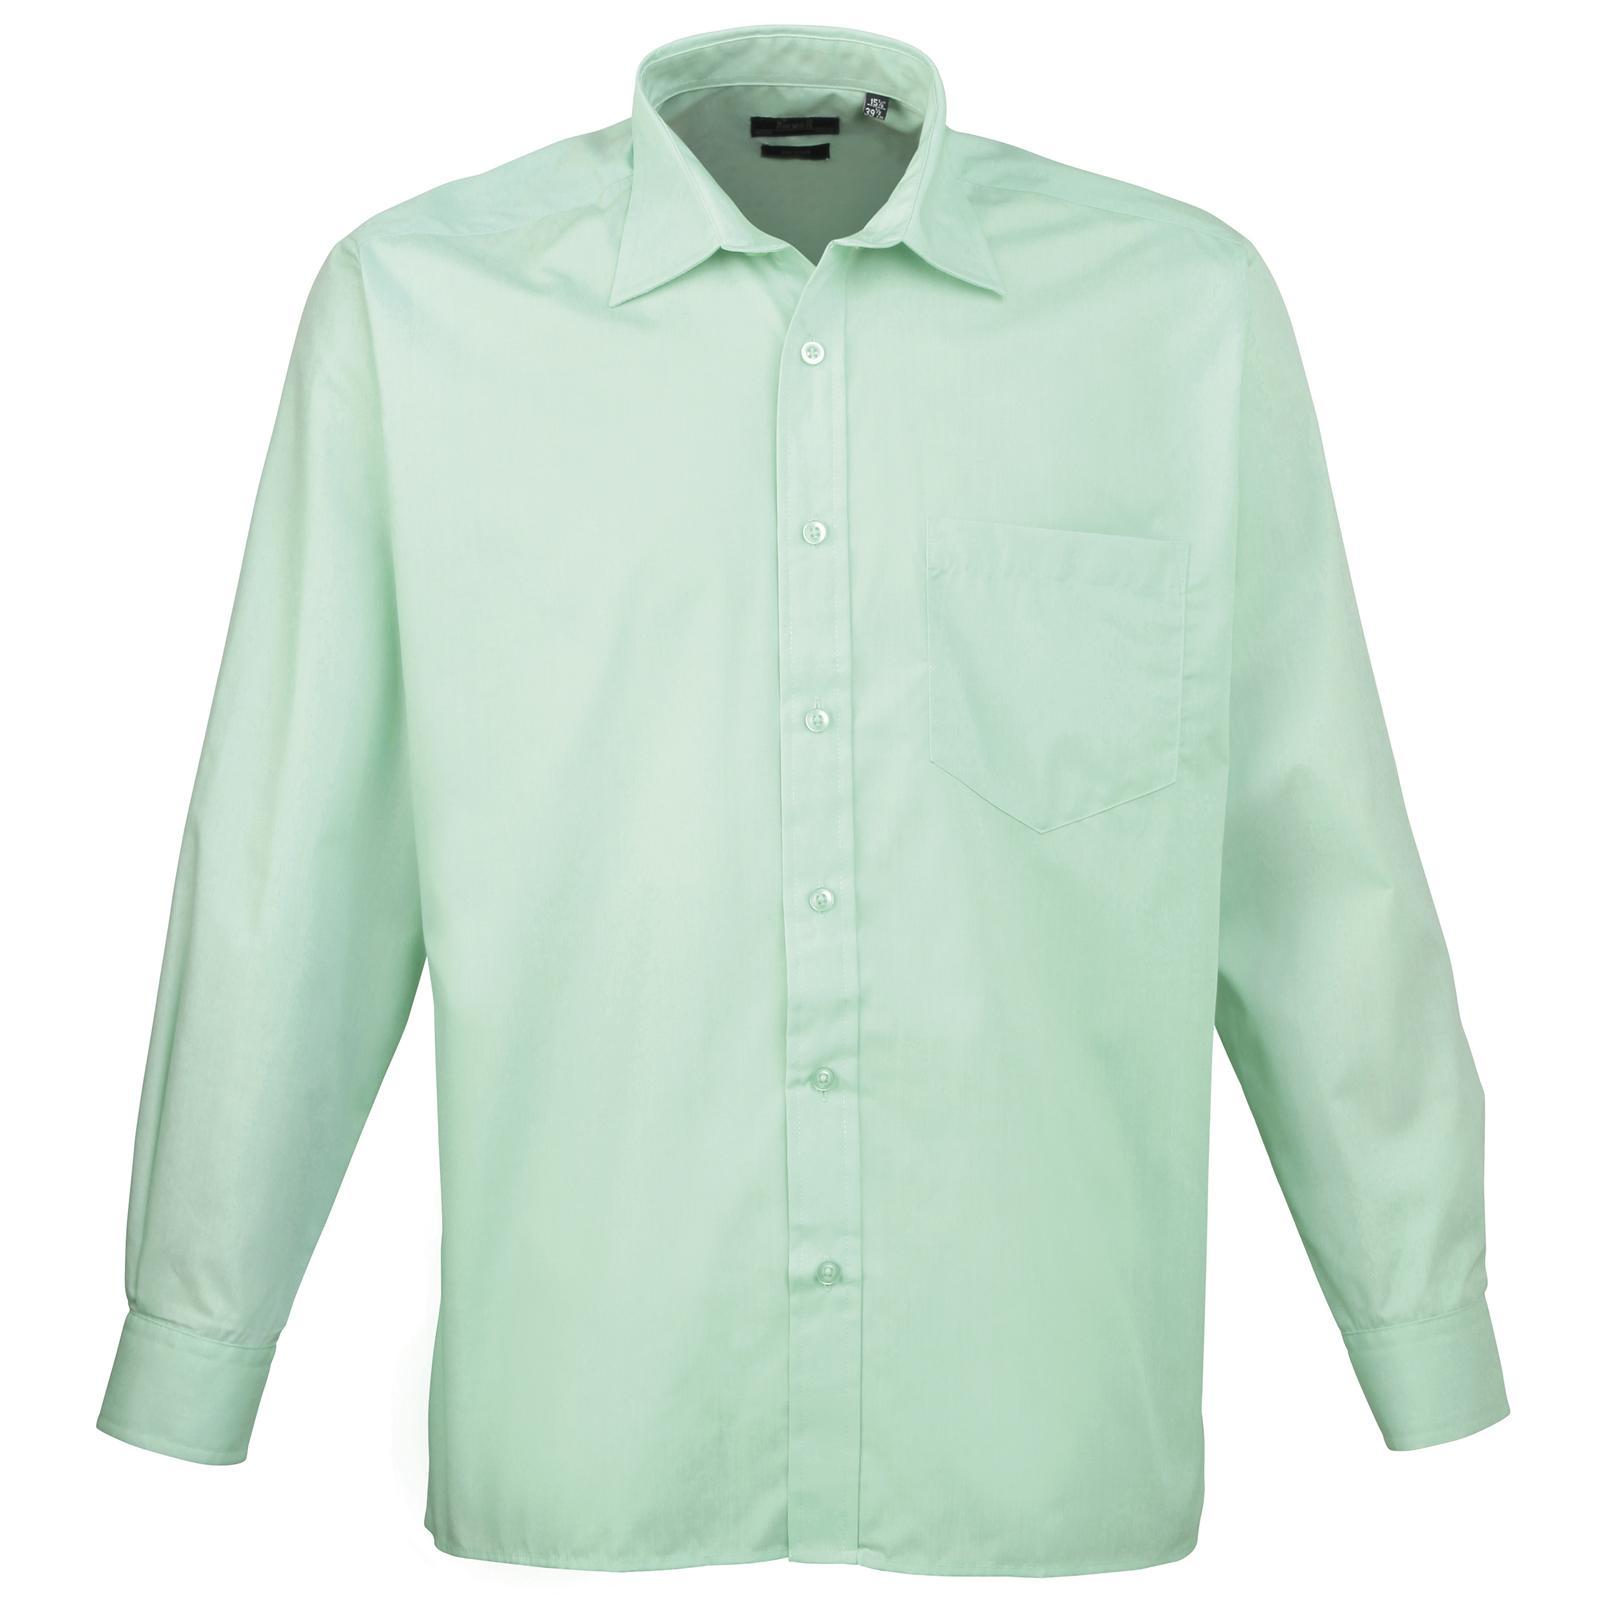 New Premier Mens Business Work Smart Long Sleeve Poplin Shirt 24